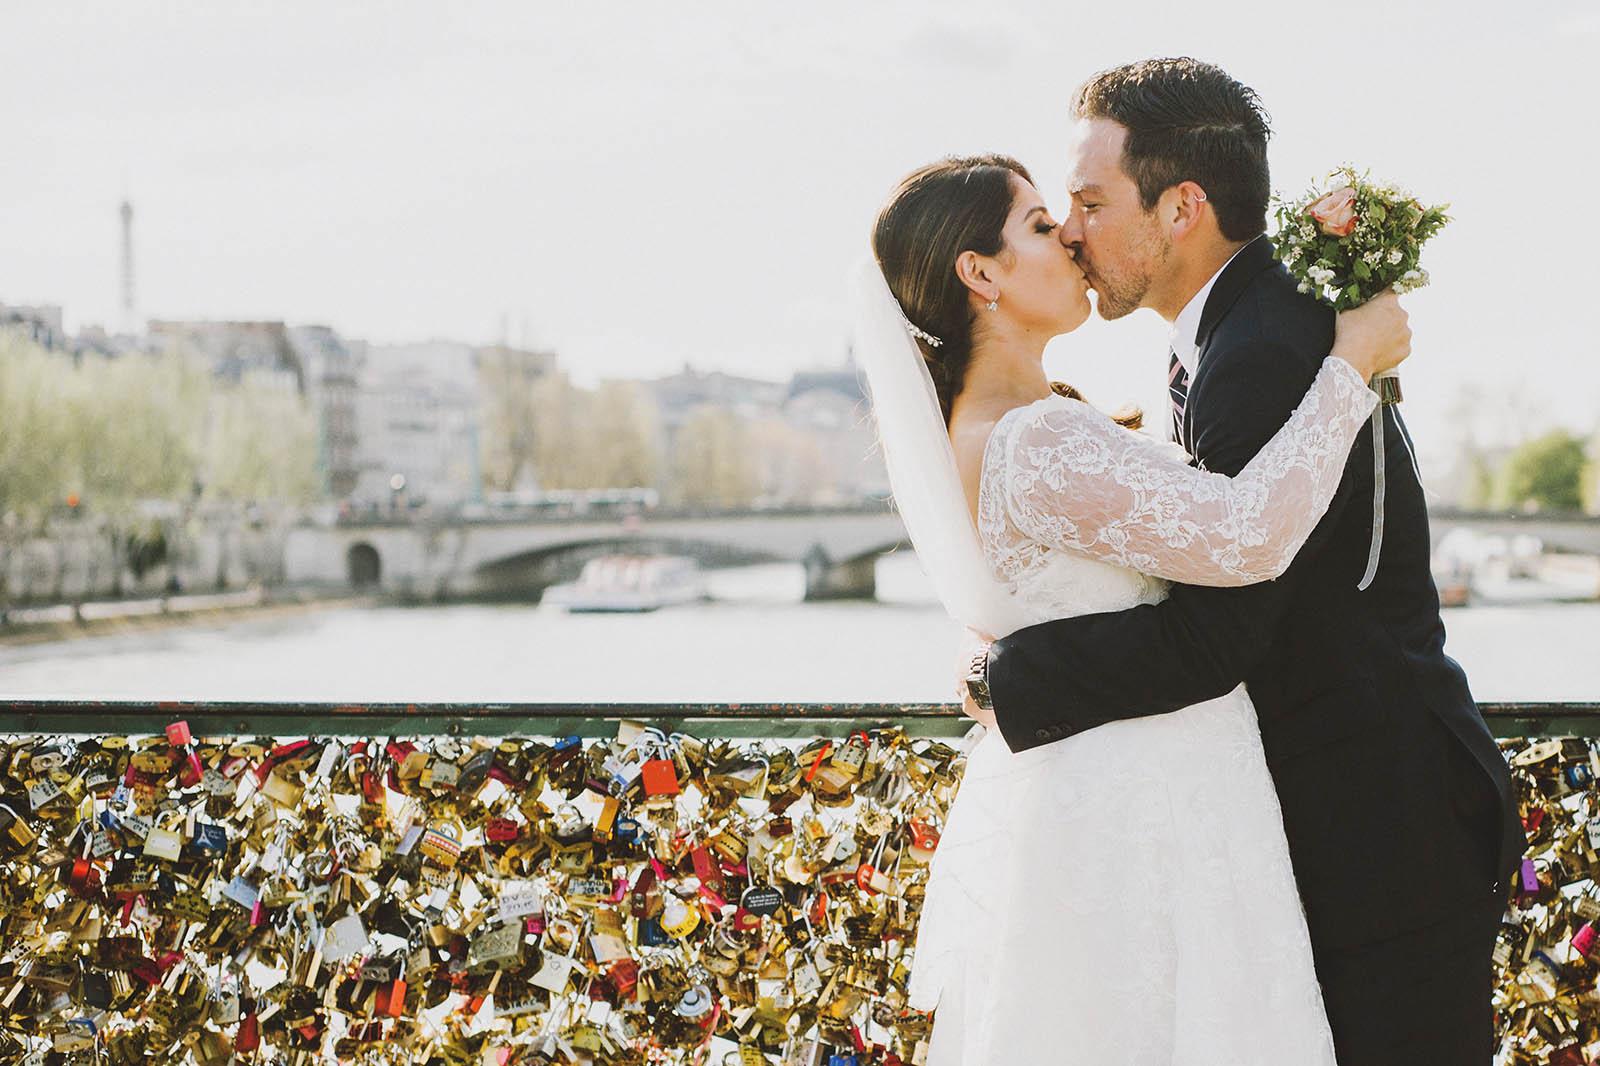 springtime-paris-elopement-kimsmithmiller-063